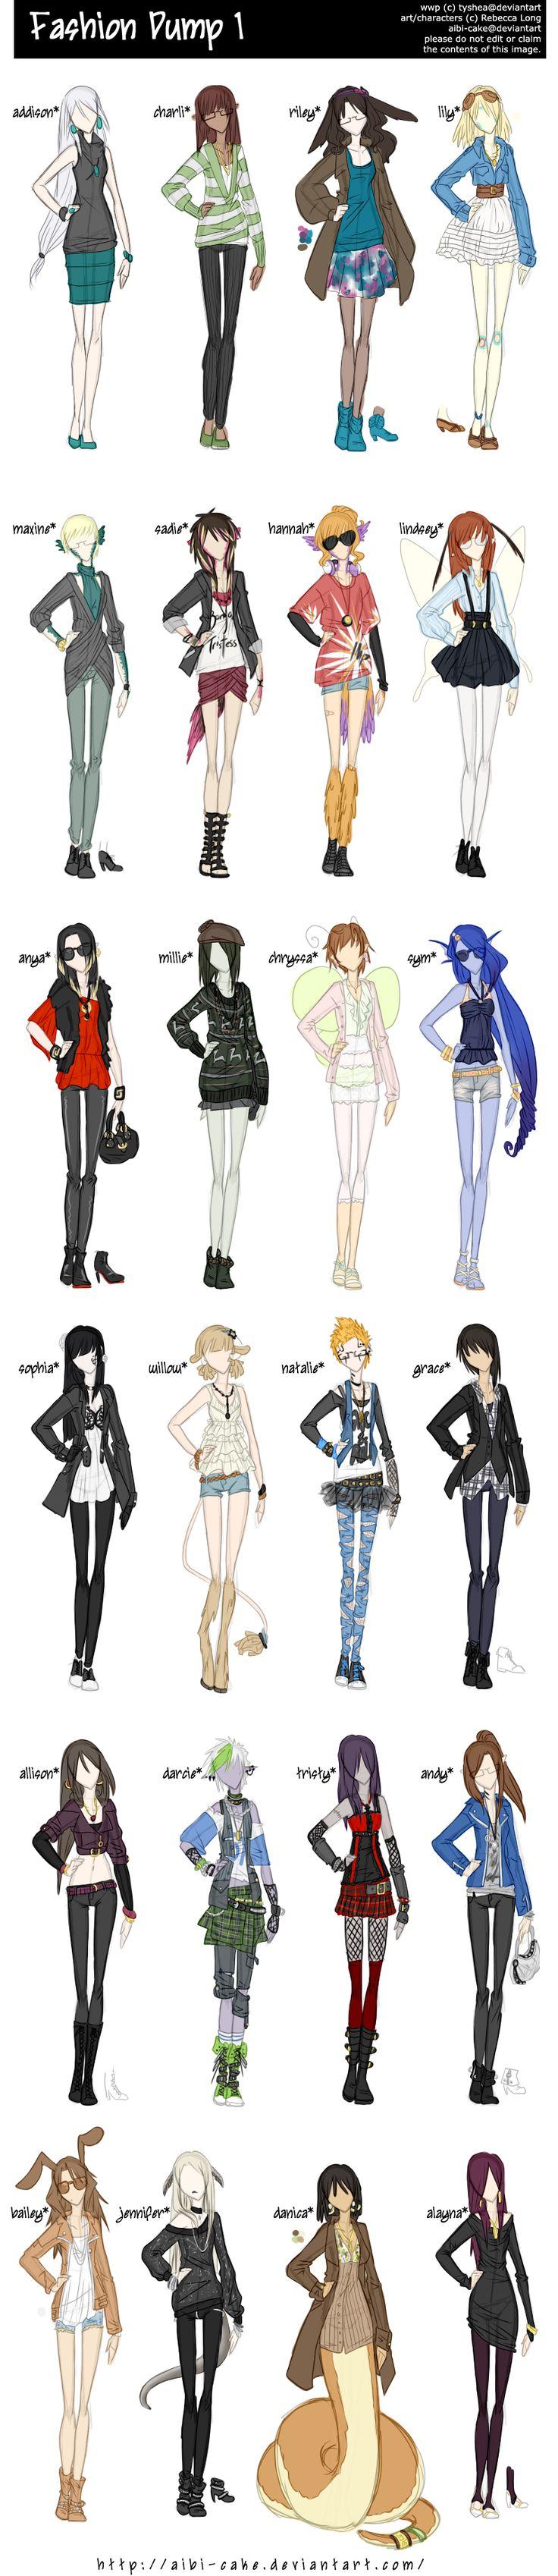 Fashion Dump 1 by *Ai-Bee on deviantART